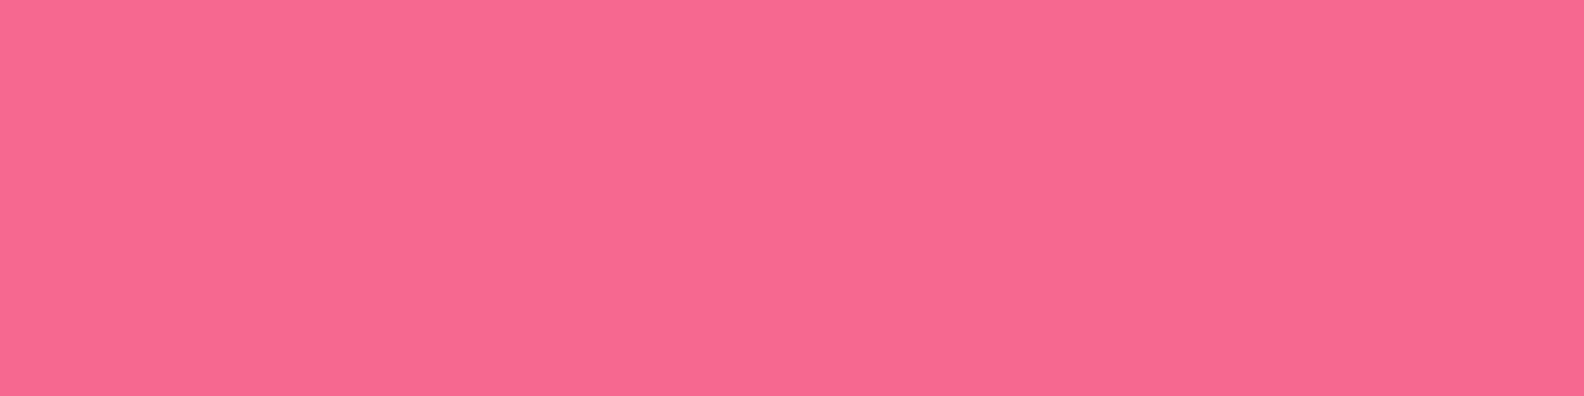 1584x396 Light Crimson Solid Color Background